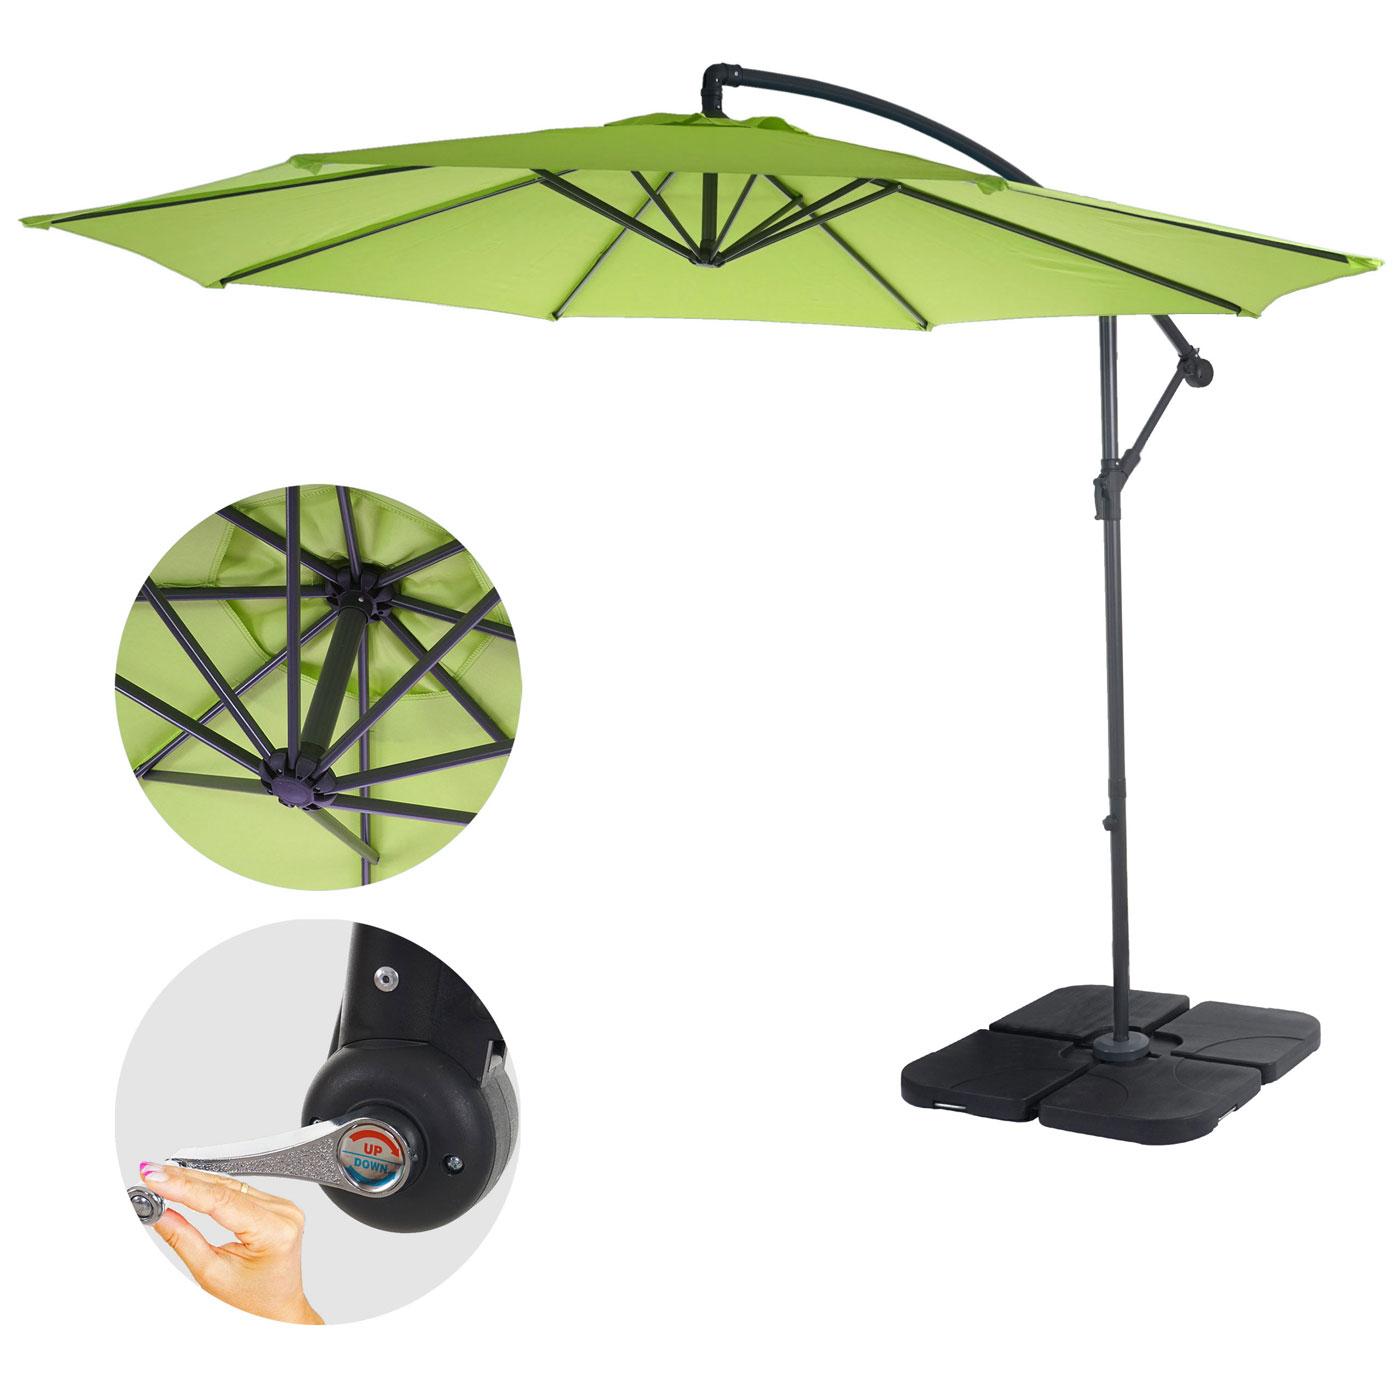 ampelschirm 3m gastronomie luxus ampelschirm sonnenschirm 3m garten alu ampelschirm. Black Bedroom Furniture Sets. Home Design Ideas